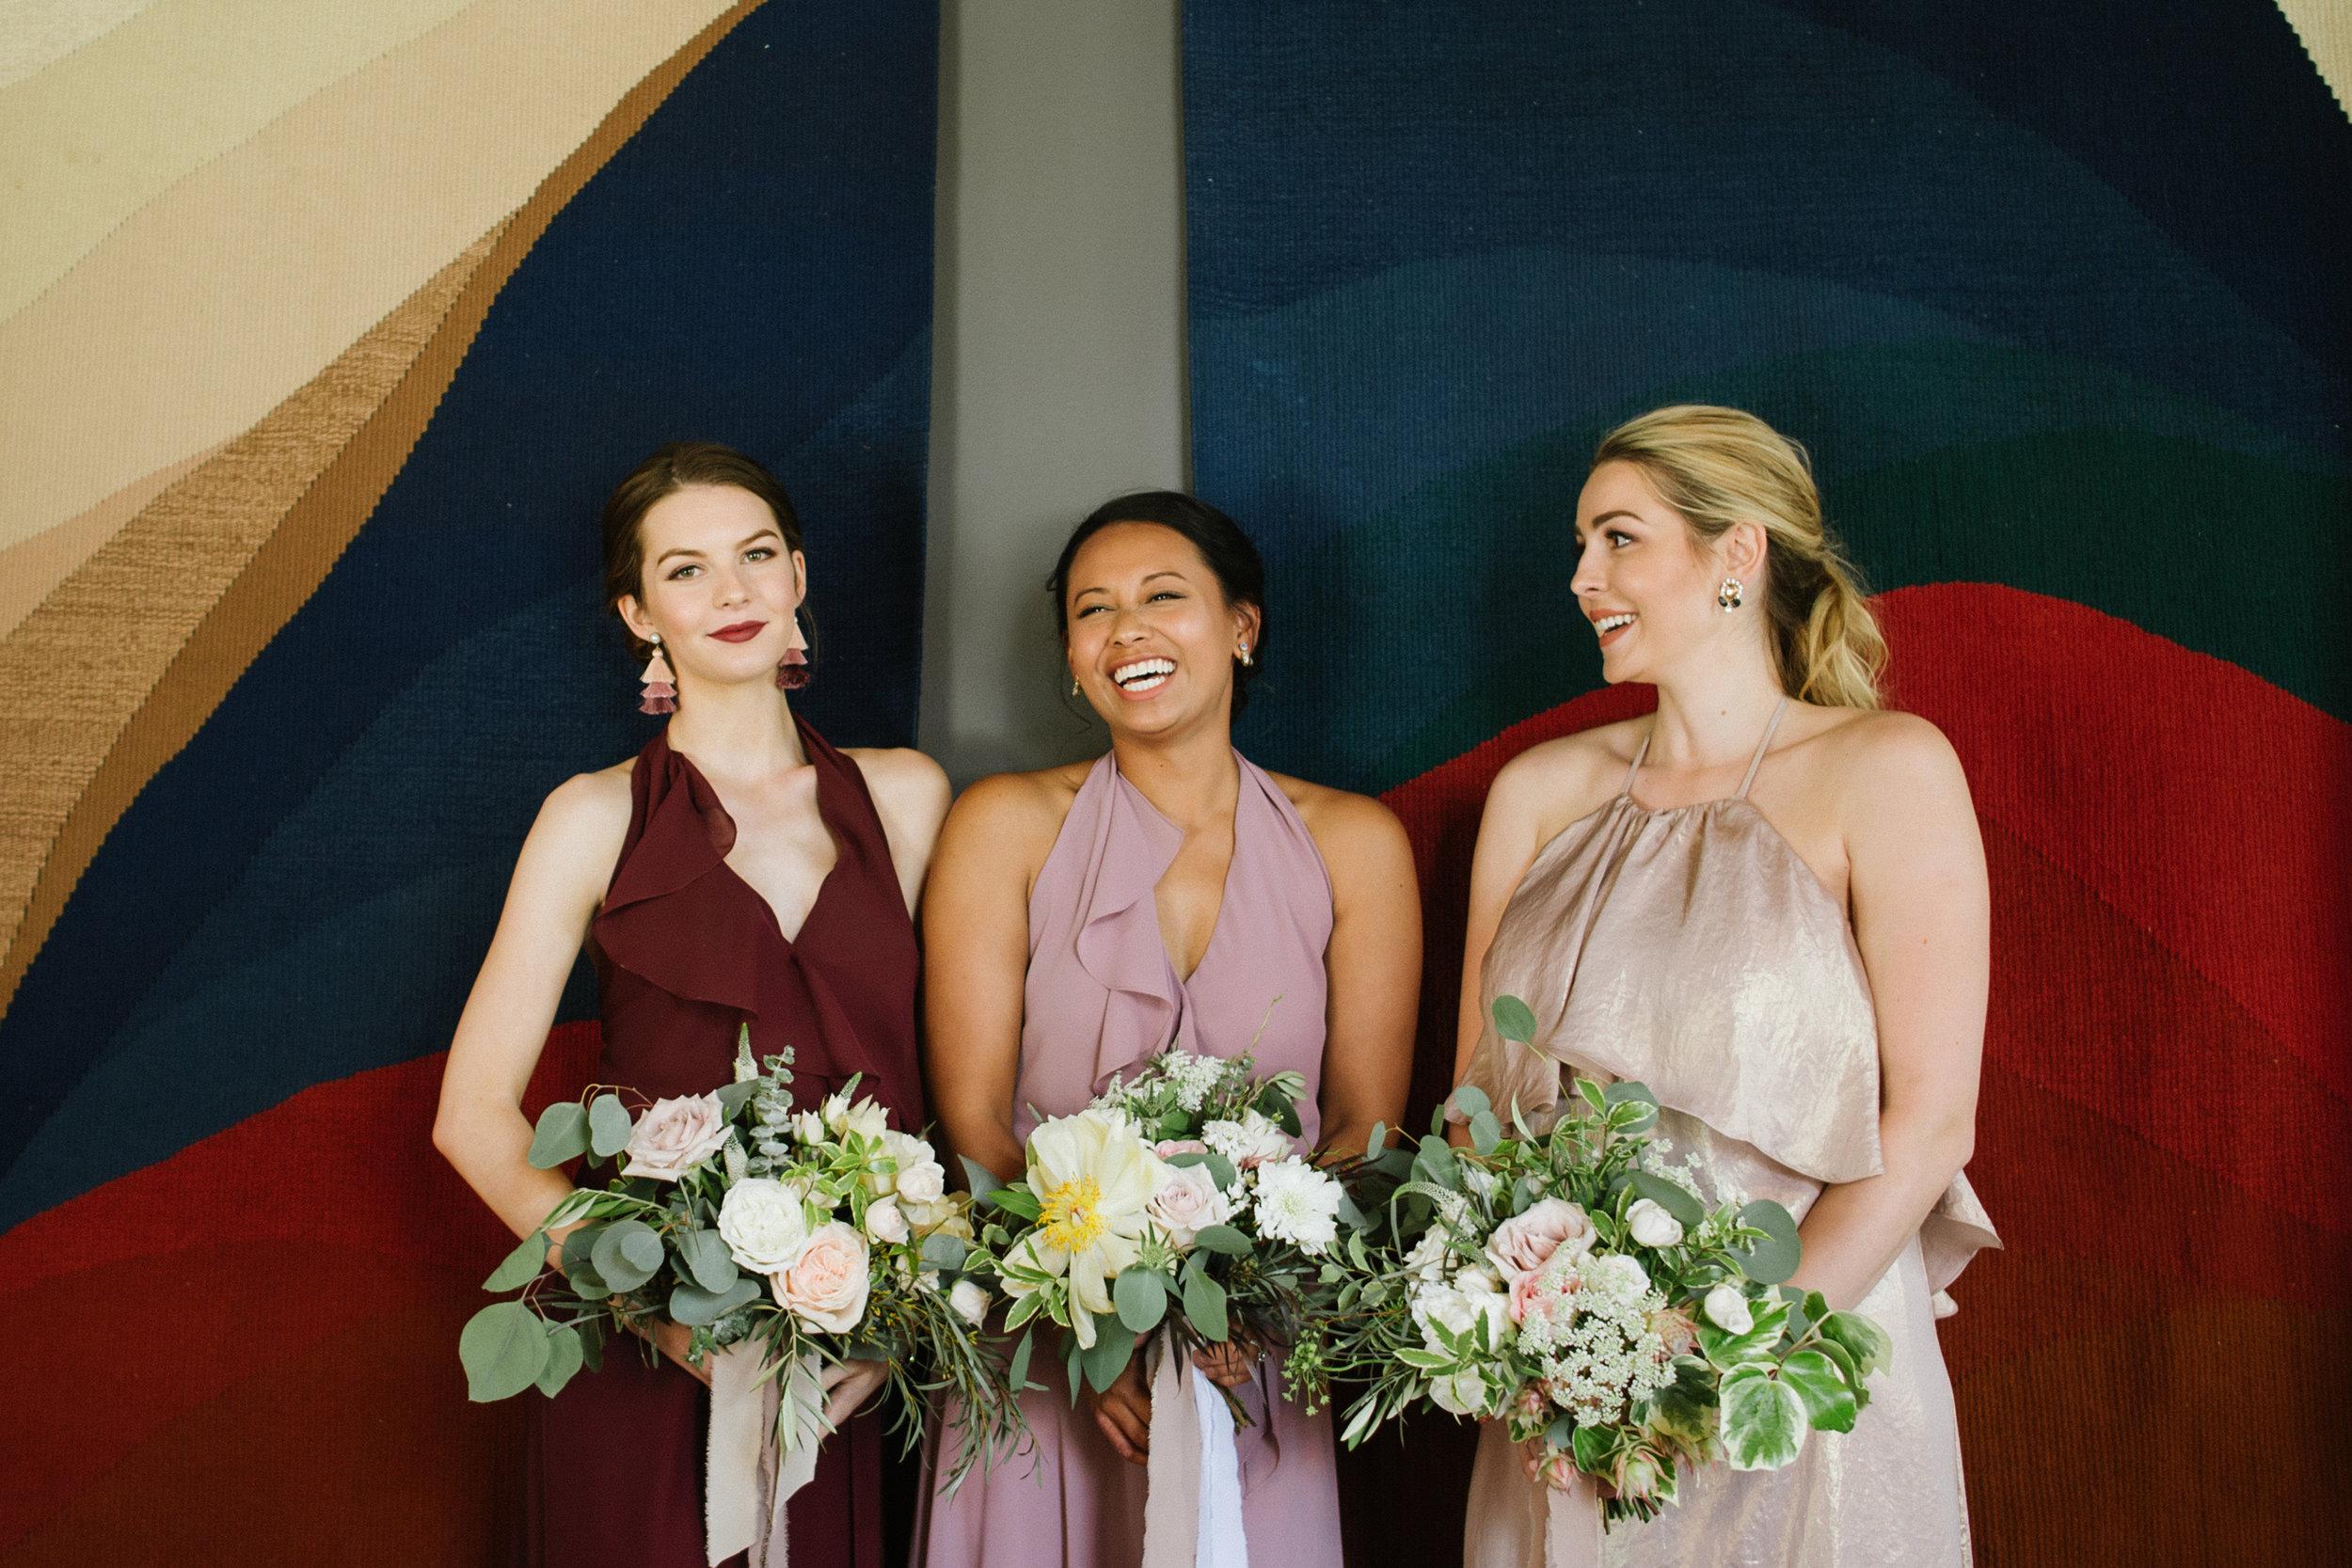 Calgary_Wedding_Photography_Bridgette_Bar_Bridesmaids_Shoot_2018_HR012.jpg